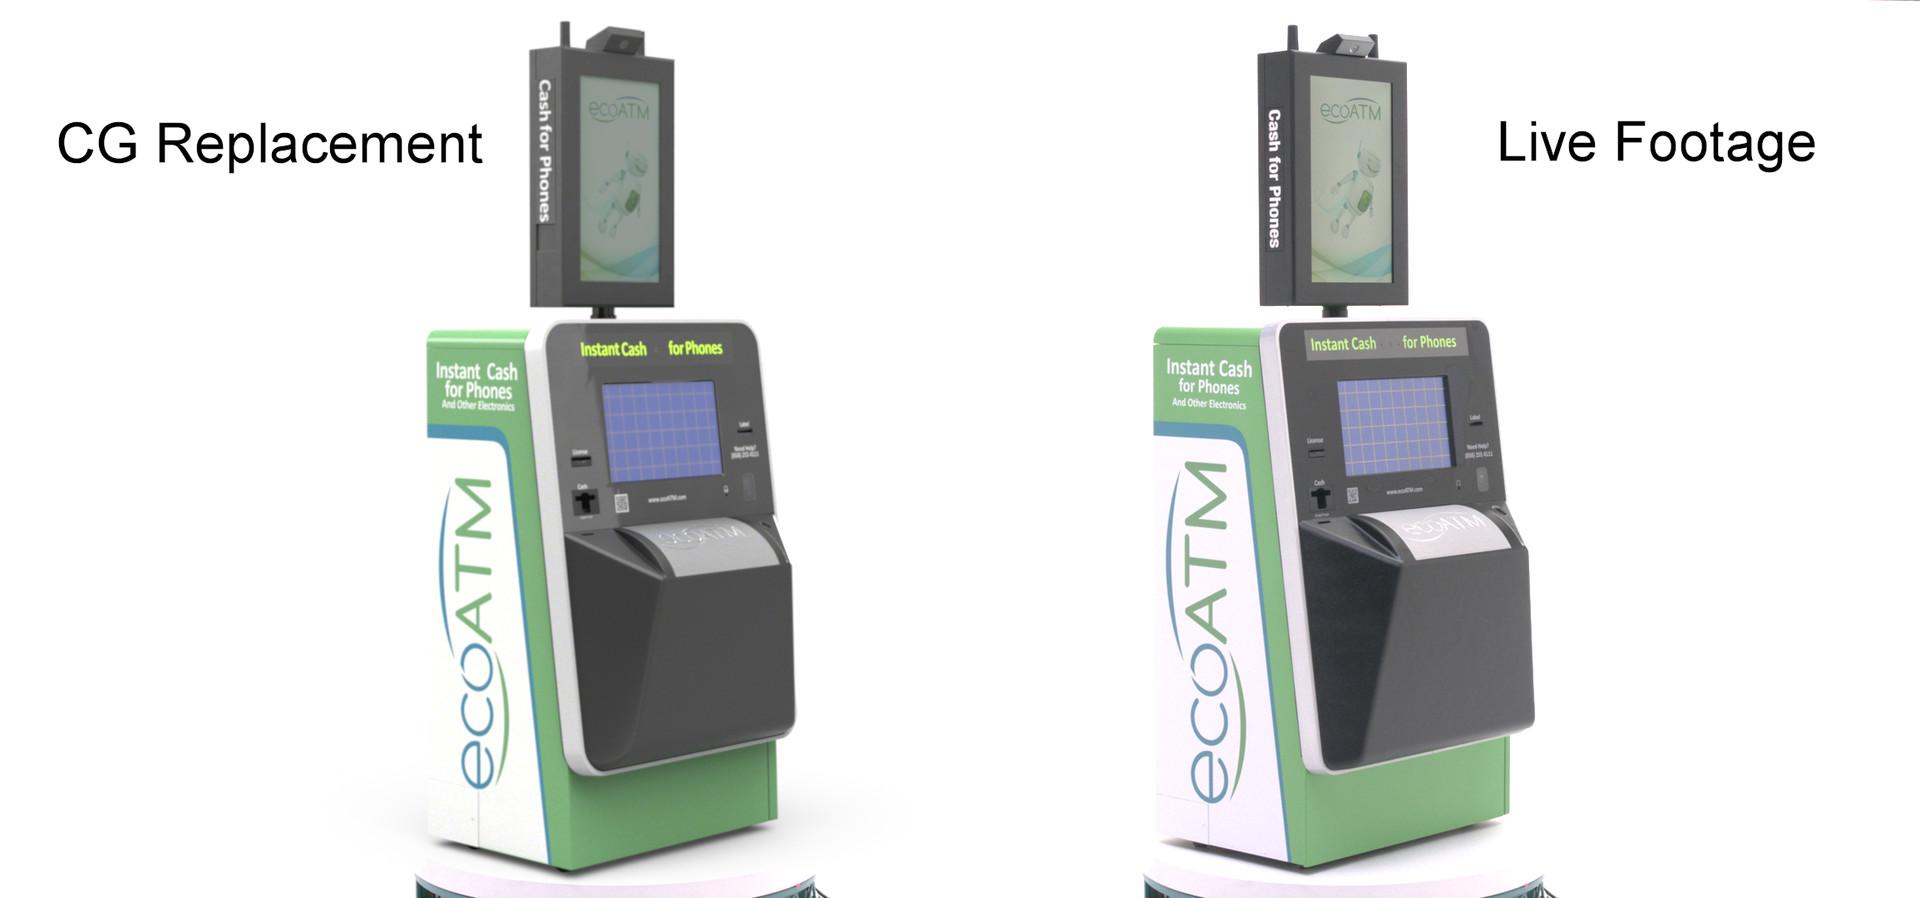 Manny Gonzales - Eco ATM